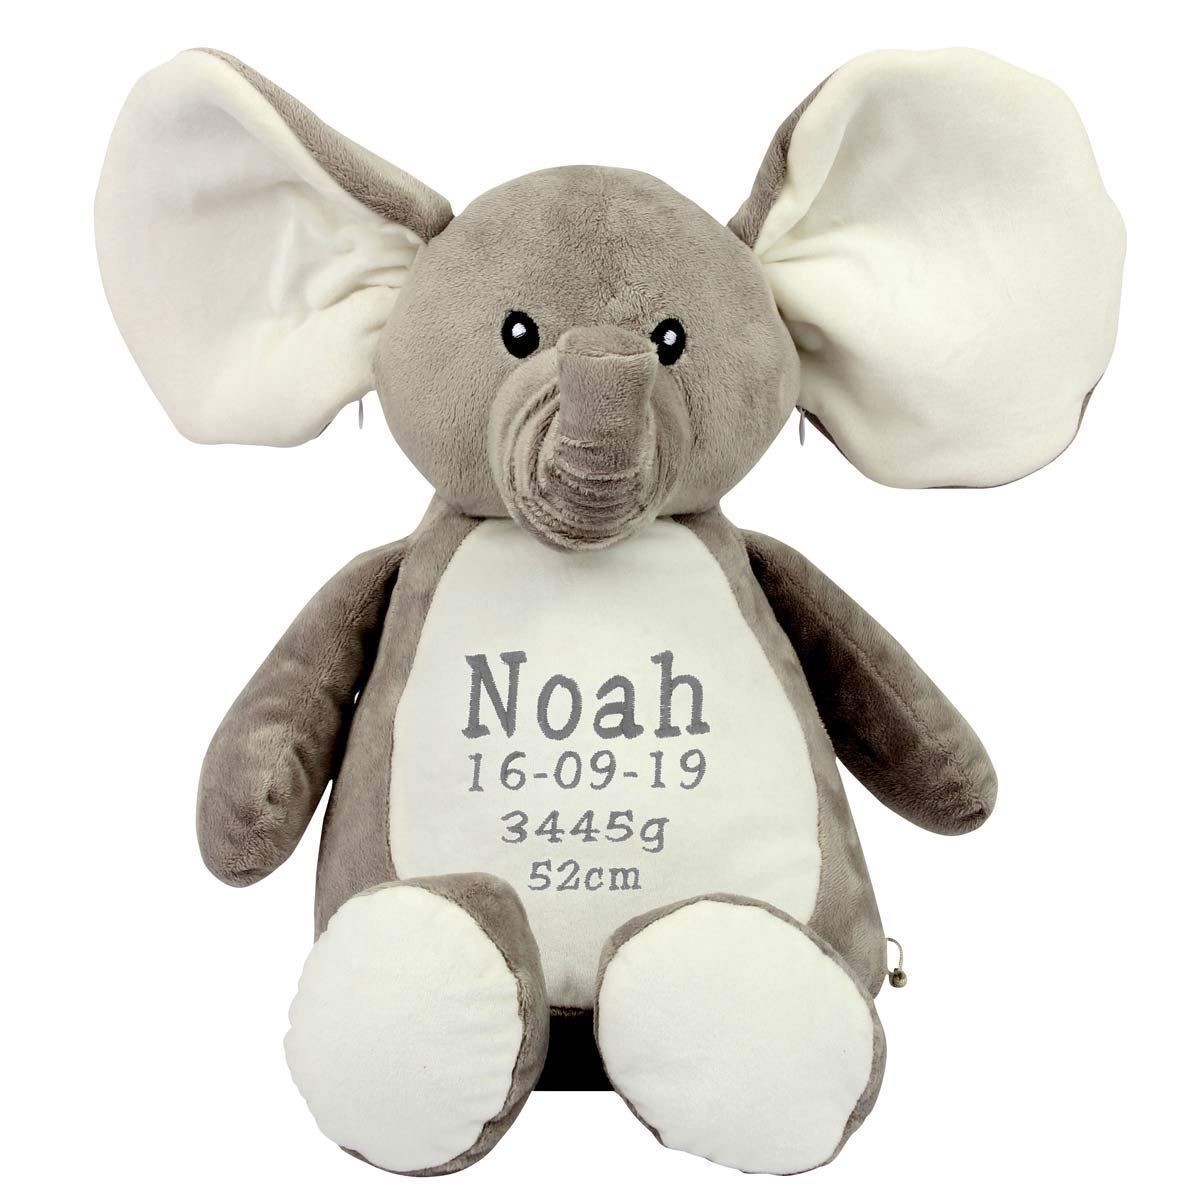 Bamse med navn. Elefant